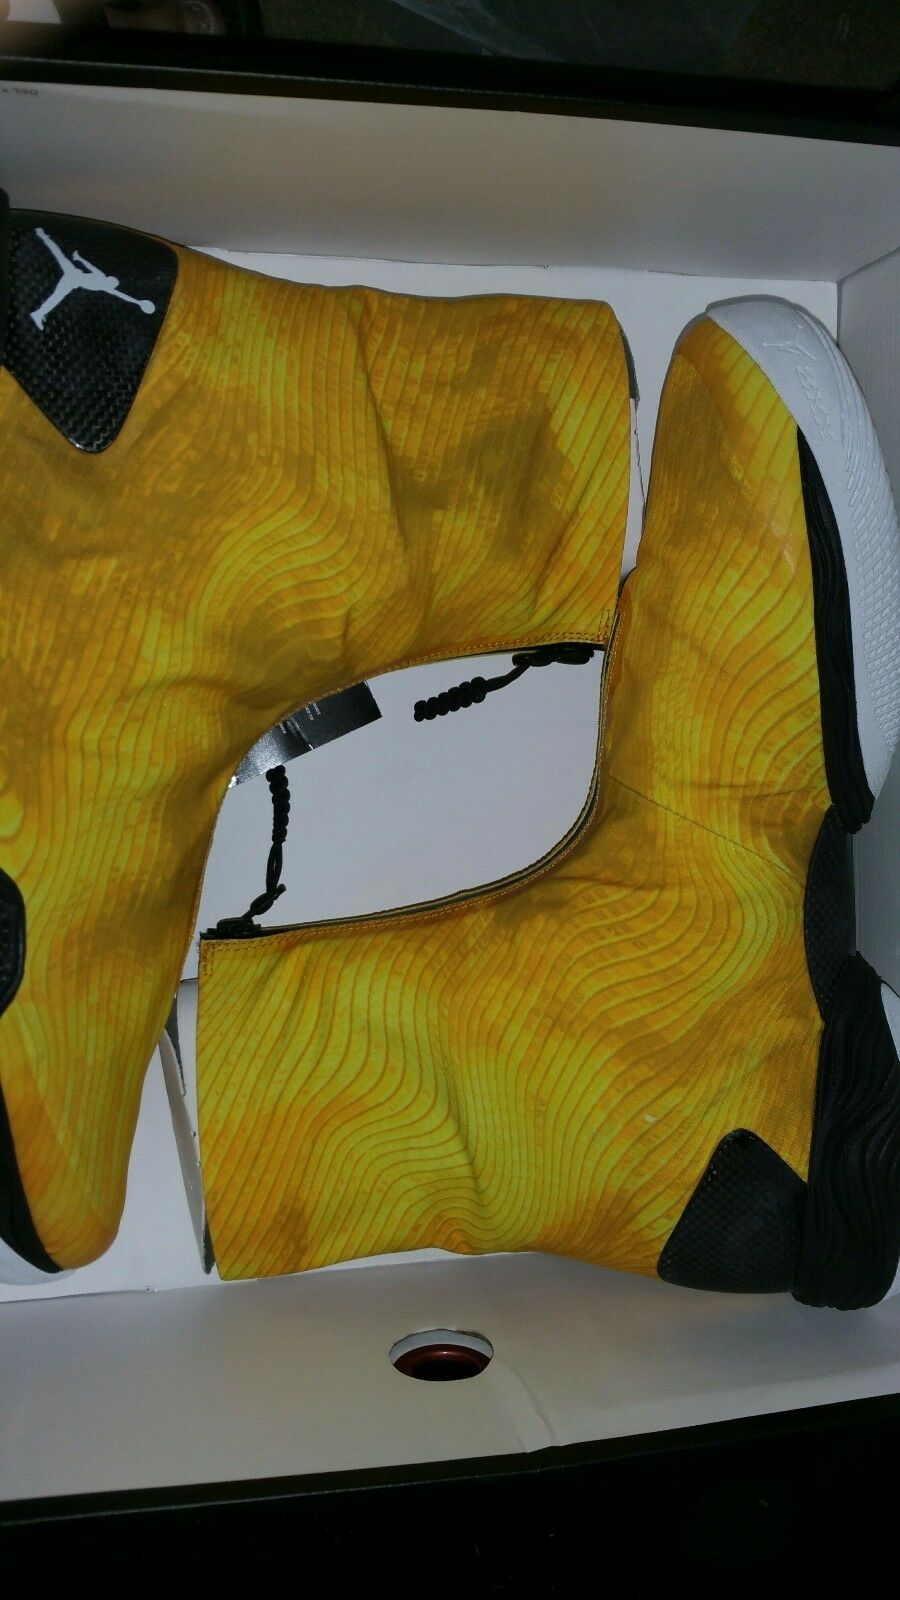 Air jordan xx8 size 13 true yellow